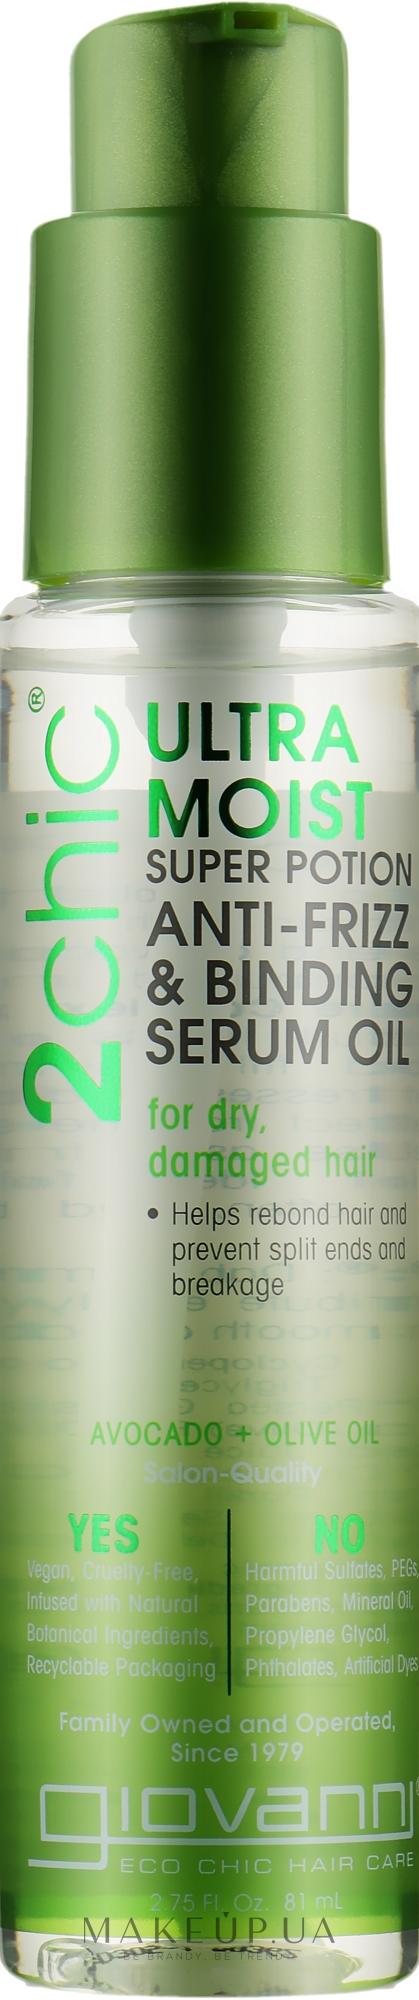 Зволожуюча сироватка для волосся - Giovanni 2chic Ultra-Moist Super Potion Anti-Frizz Binding Serum Avocado & Olive Oil — фото 53ml